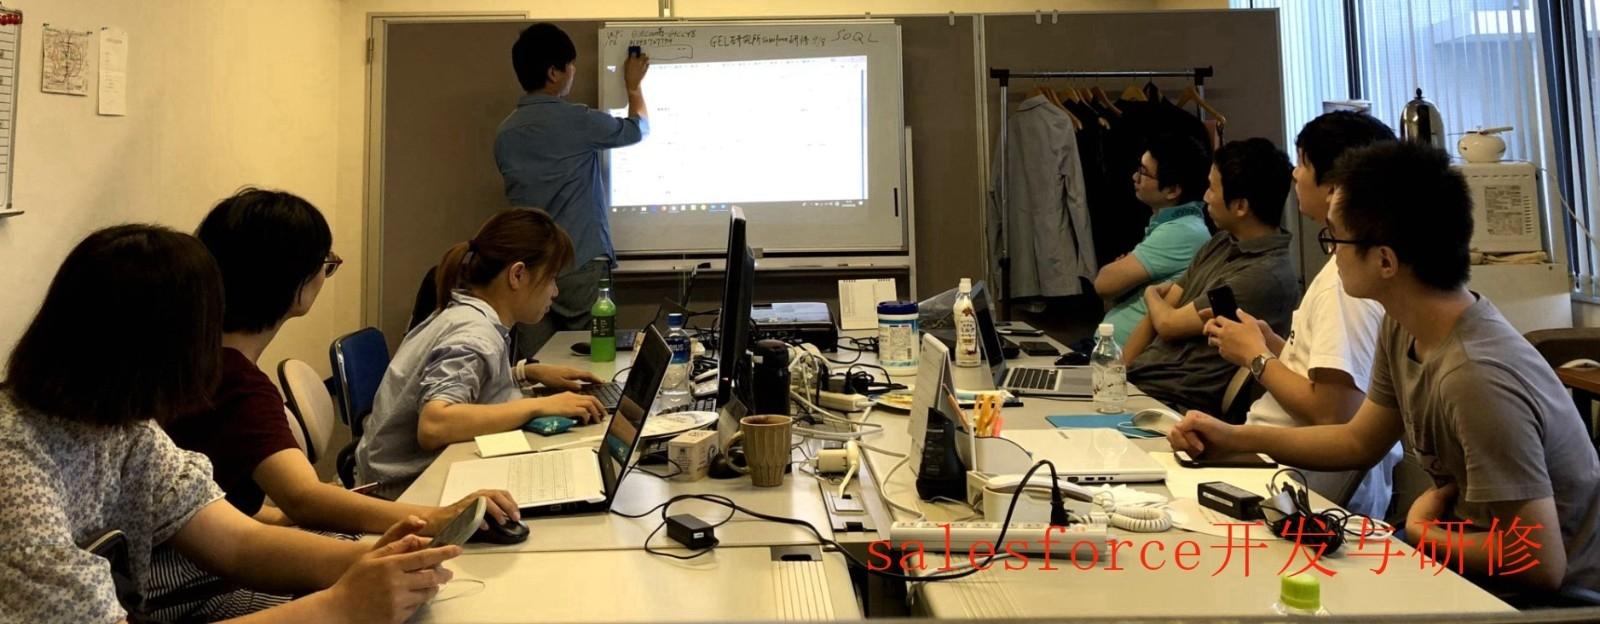 salesforce开发与研修.jpg